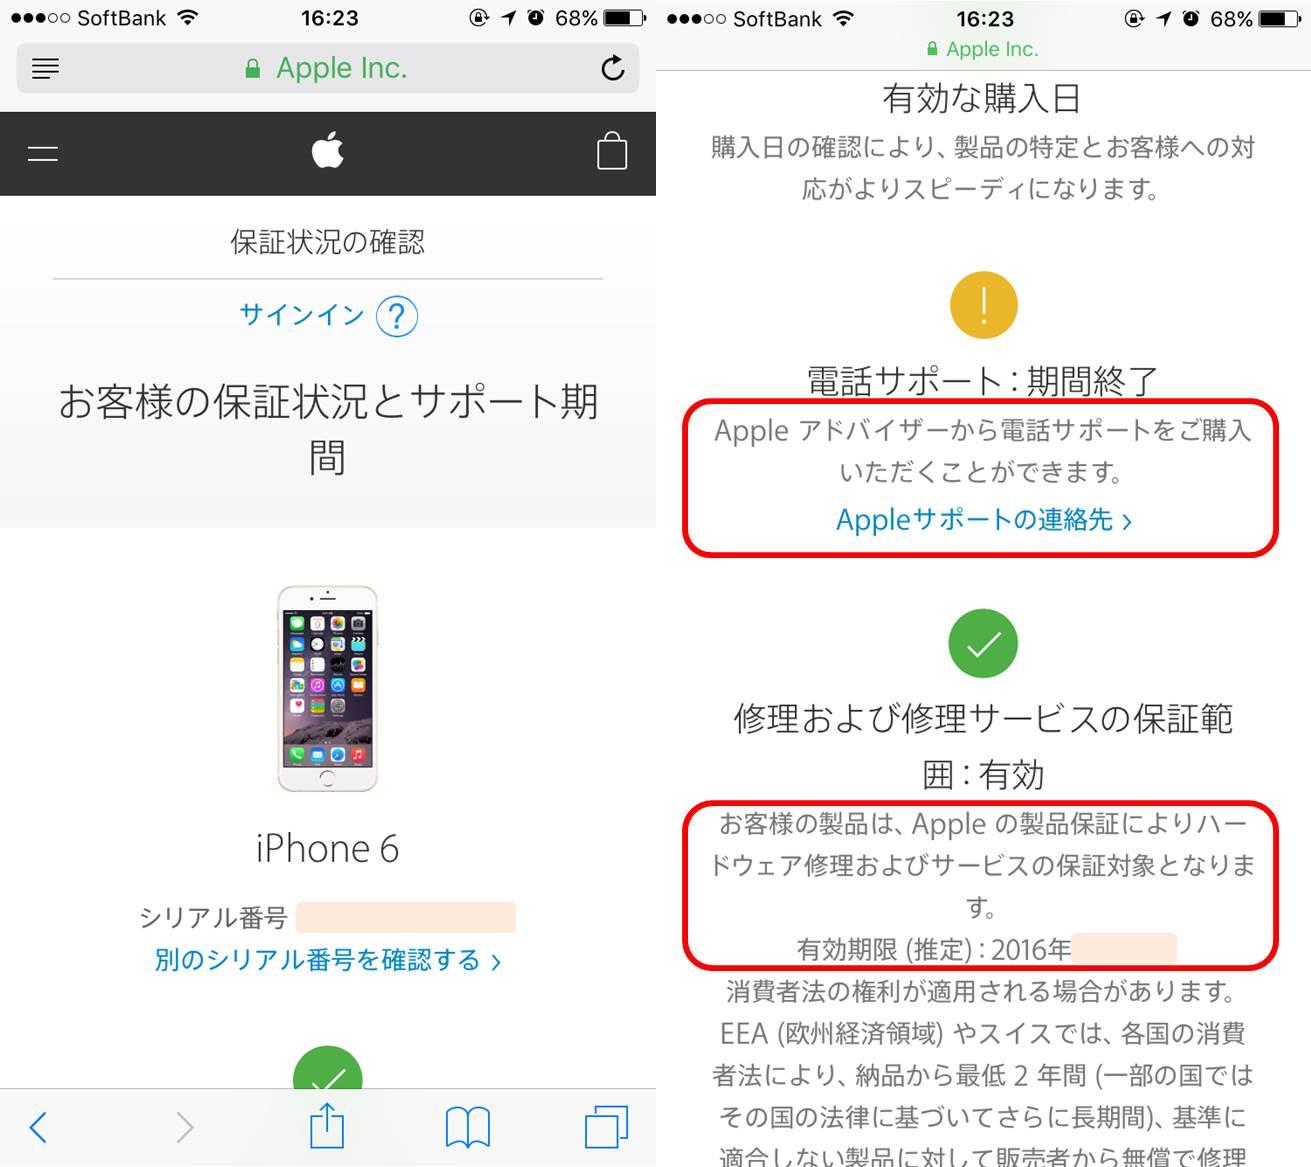 AppleCare+の加入確認